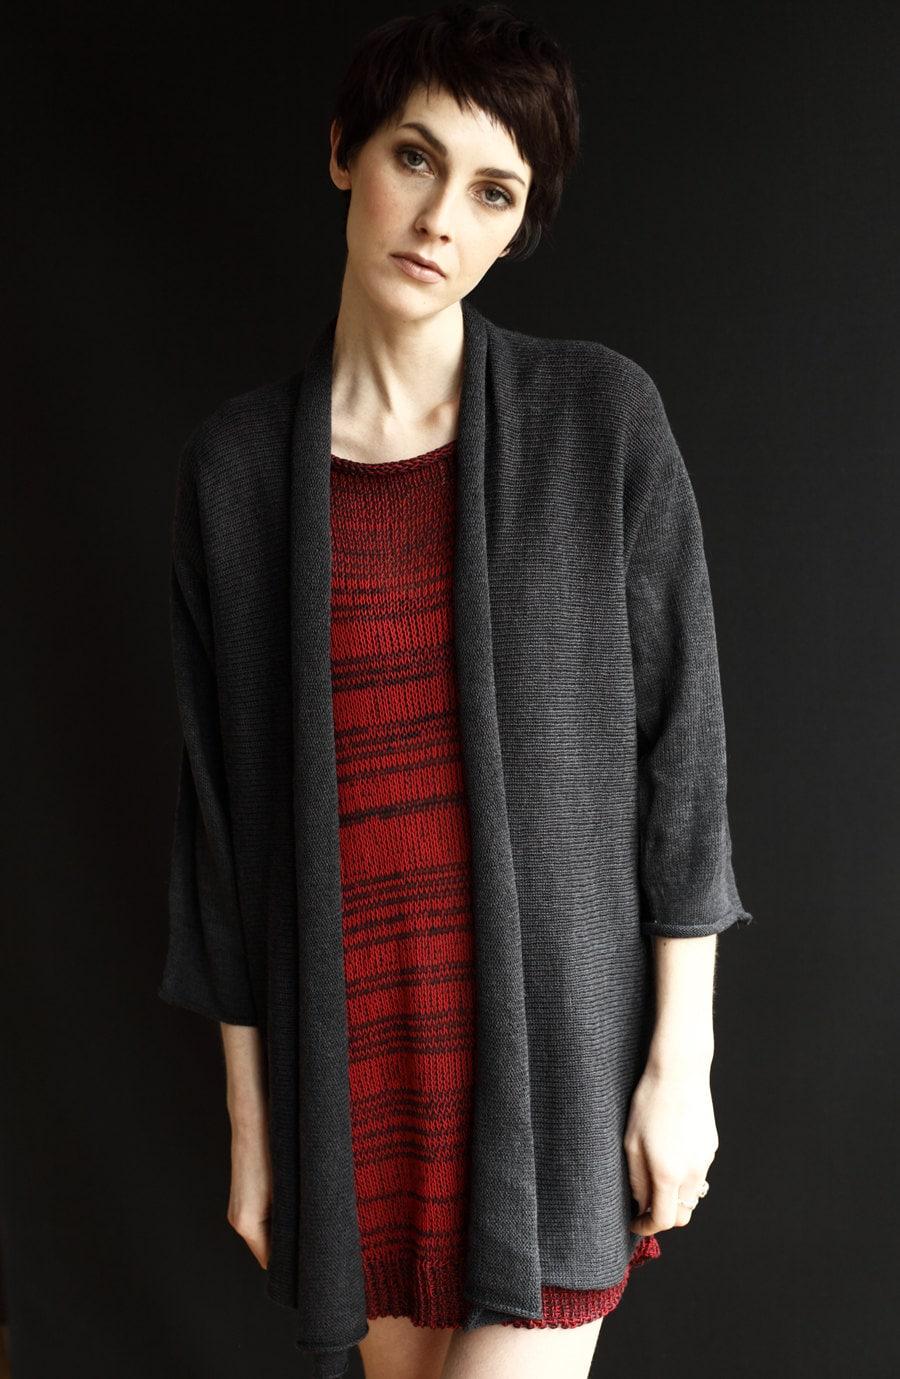 Merino Wool Kimono Cardigan Knitted Open Sweater Shawl Collar Upper Thigh To MidThigh Length HandMade HandLoomed Charcoal Grey